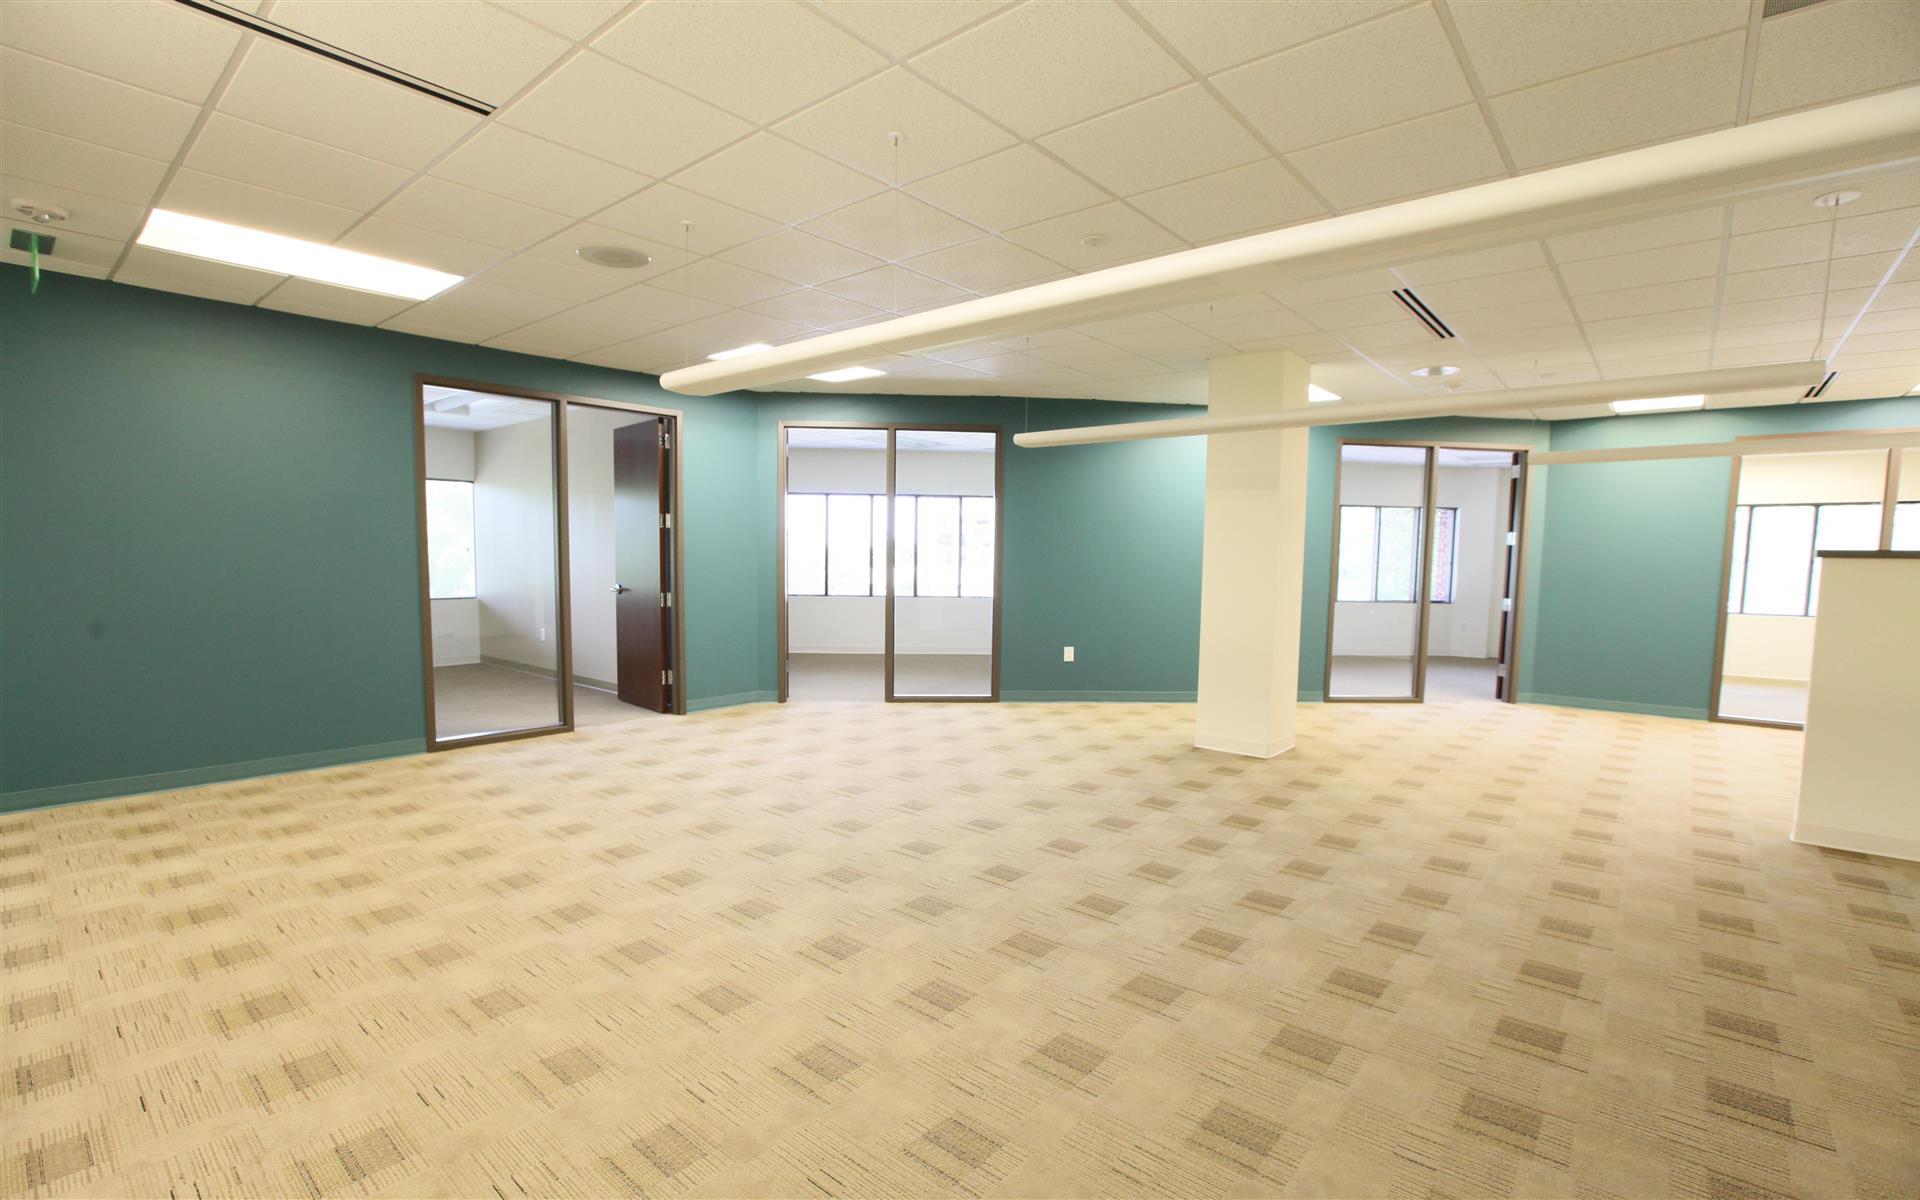 Highwoods   3600 Glenwood Avenue - Team Space   Suite 205